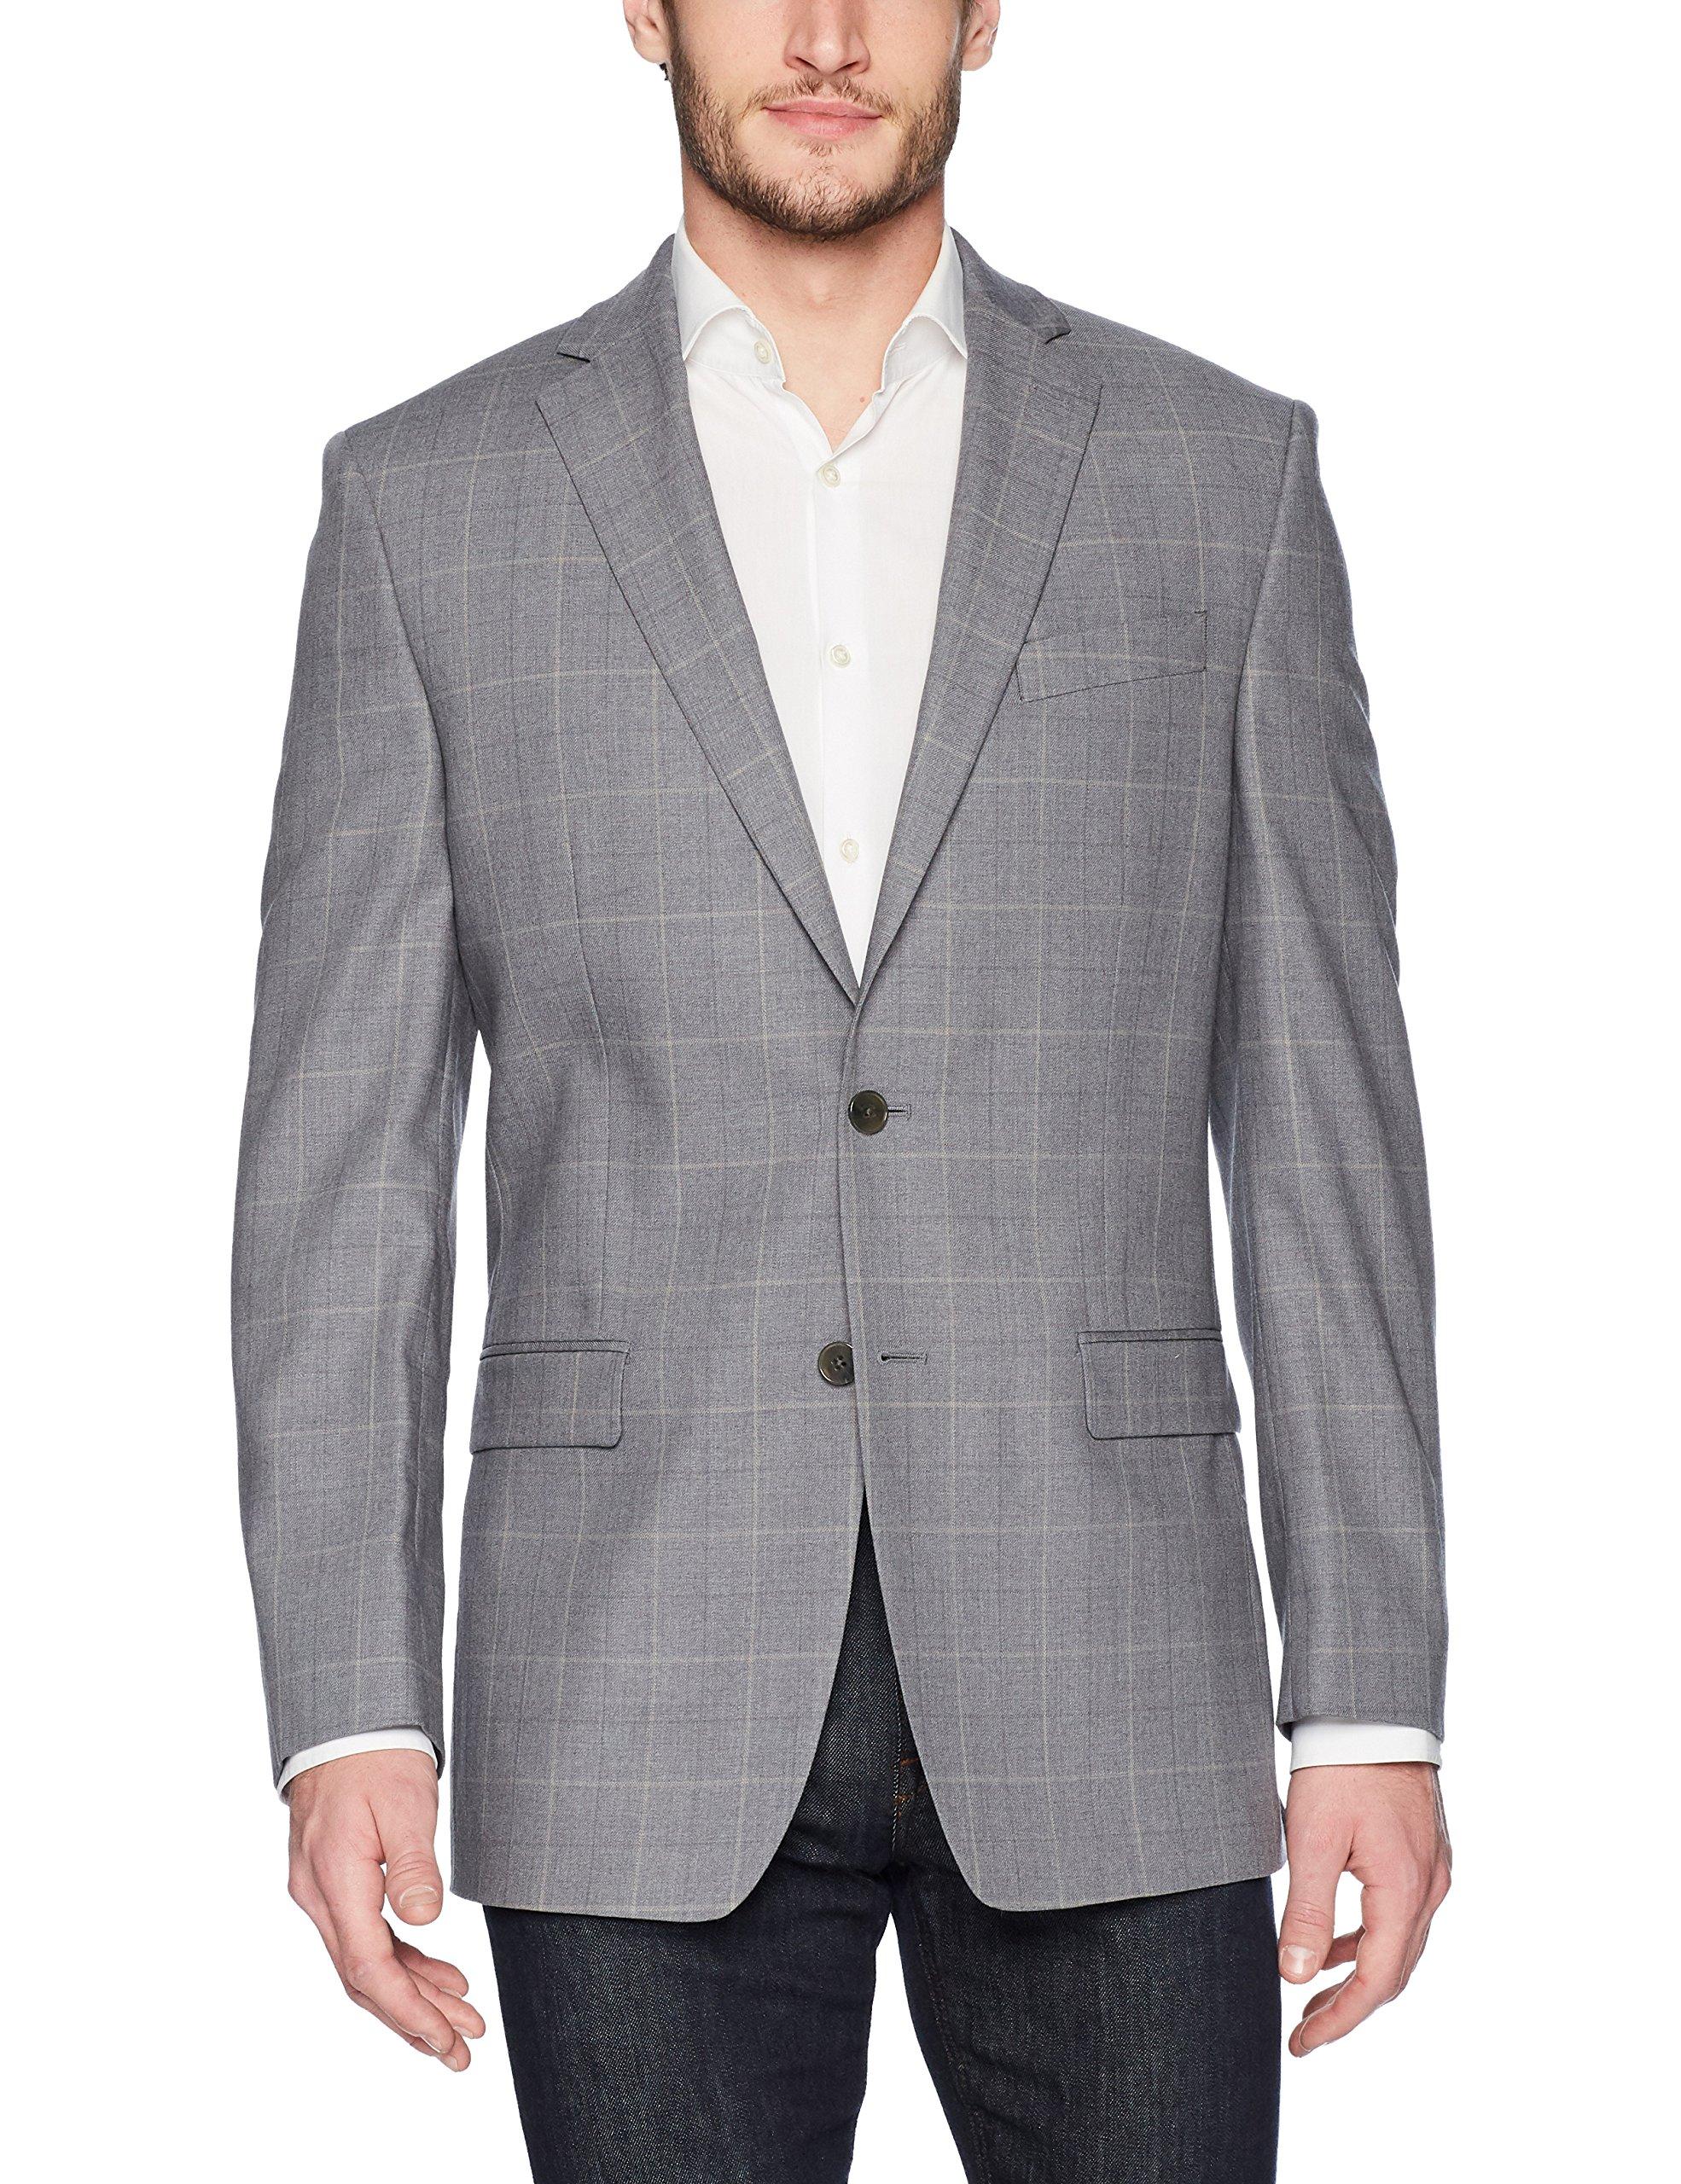 Calvin Klein Men's Malik Slim Fit Single Breast 2 Button Blazer, Gray/Cream, 40 Regular